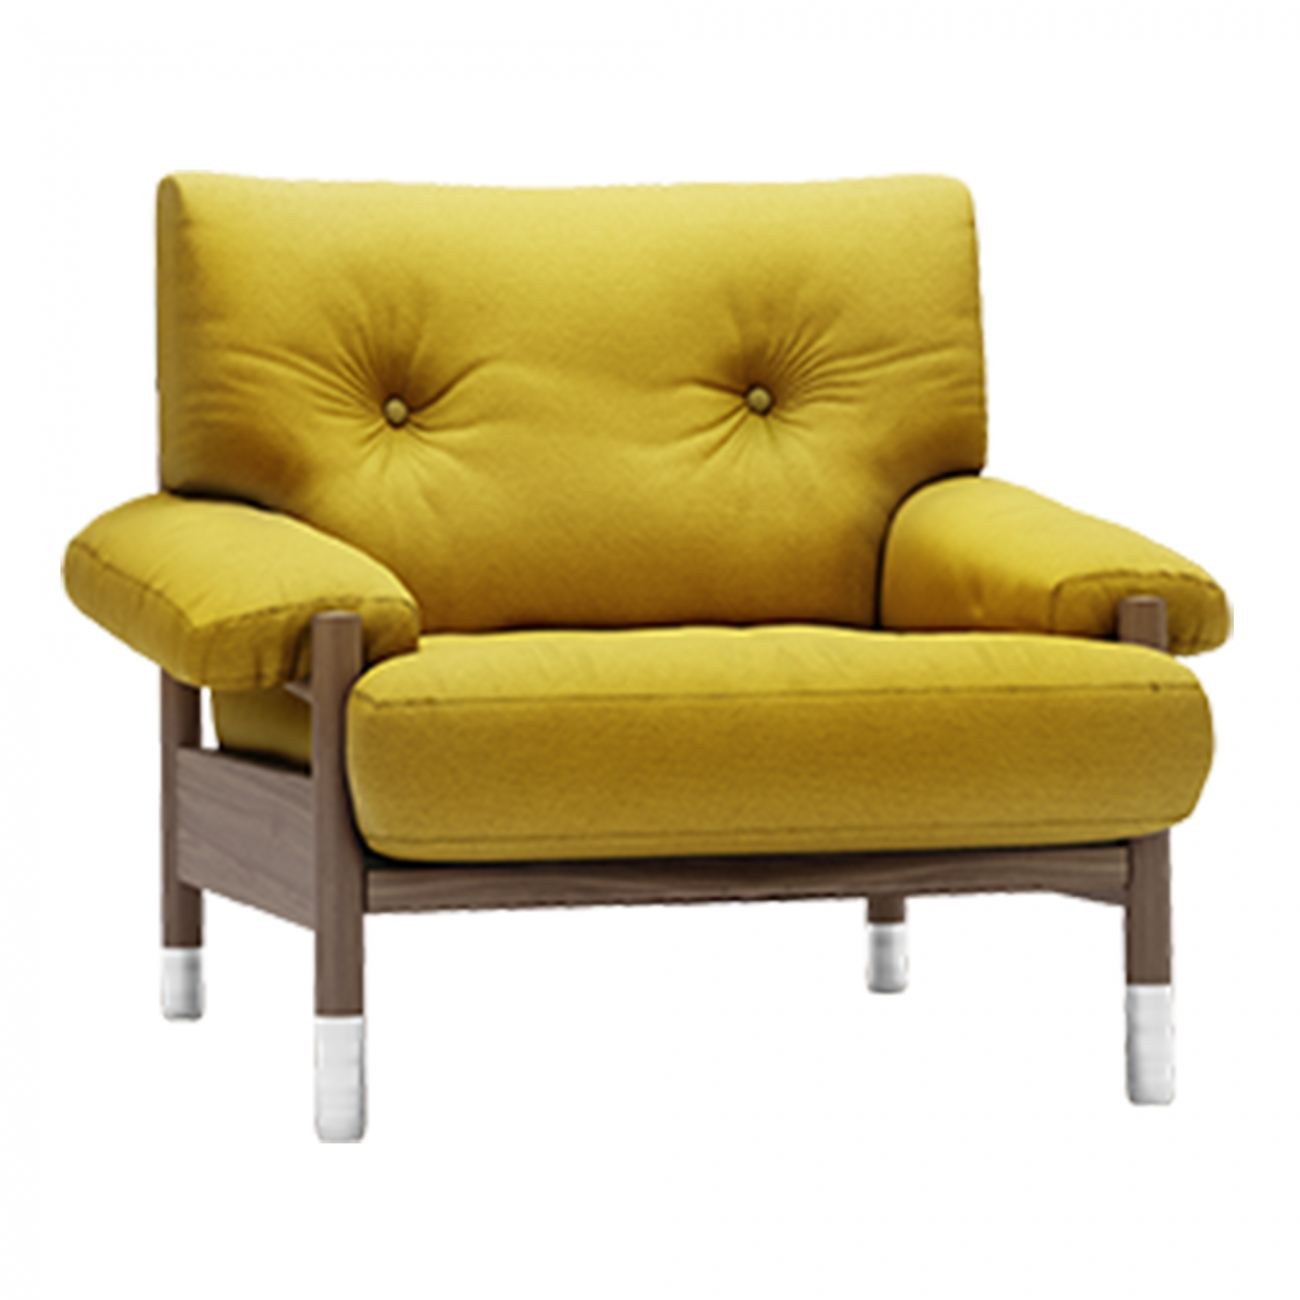 Tacchini Sella Armchair